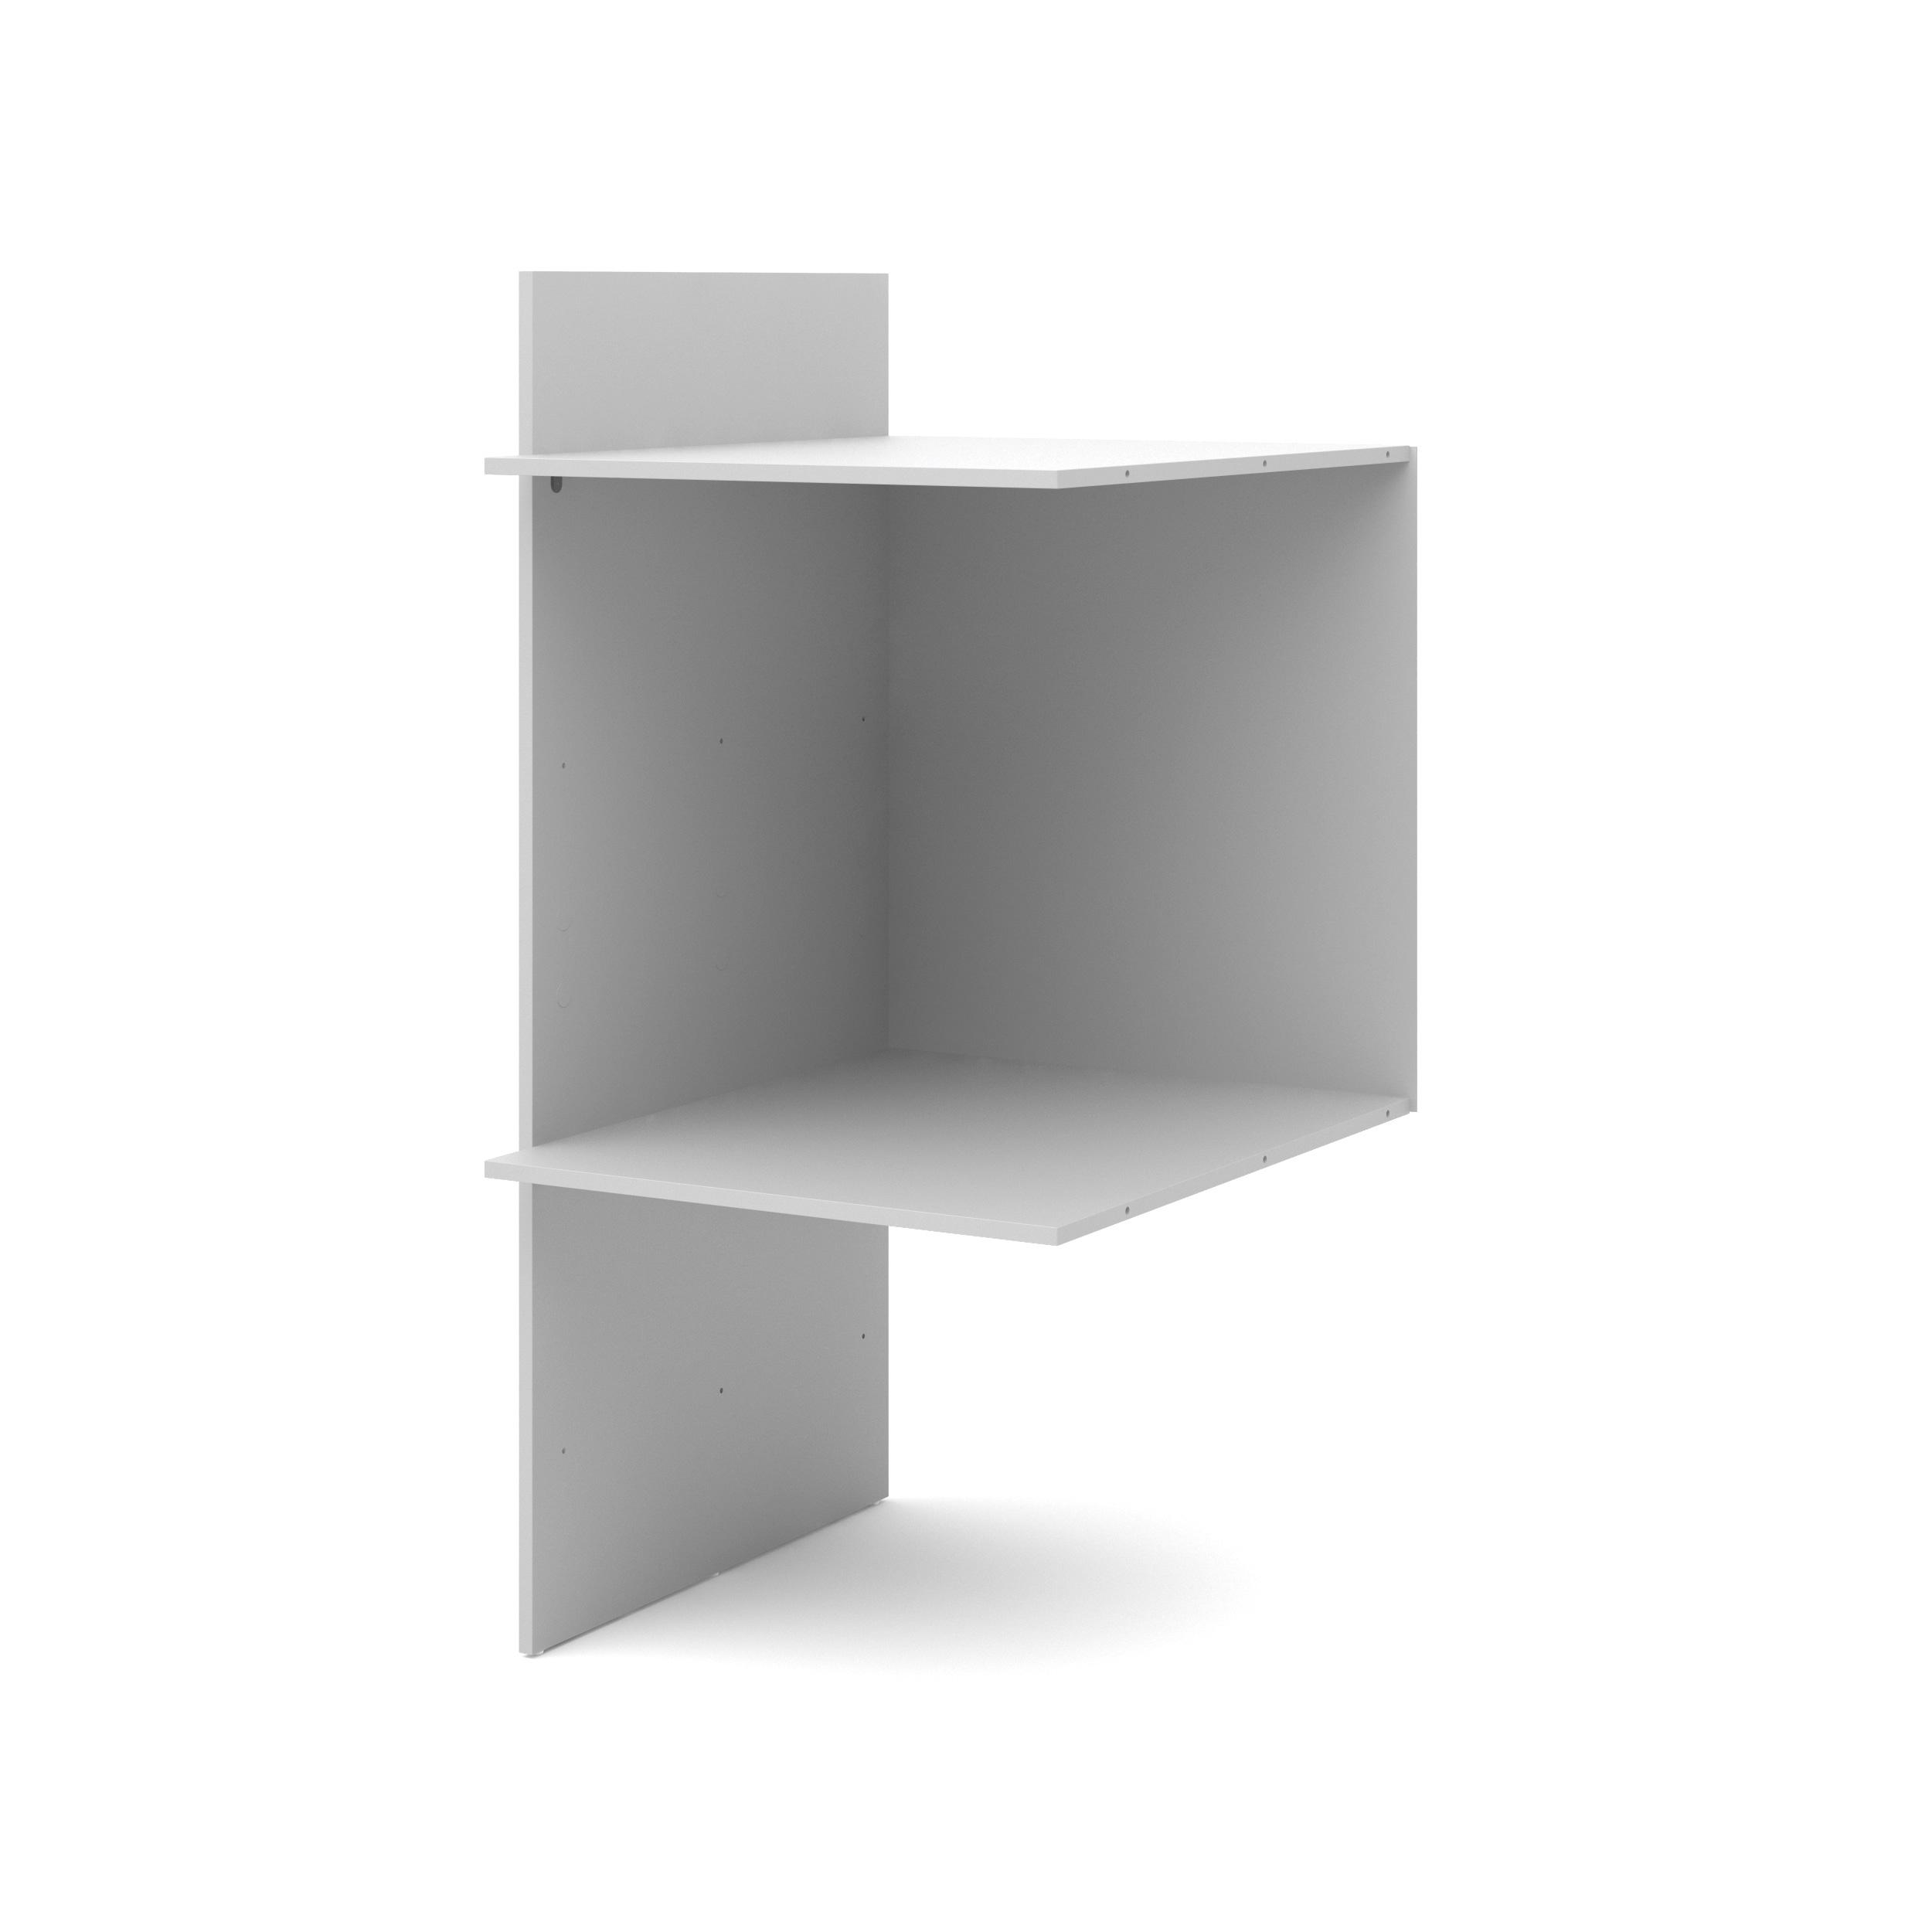 Space Silver Grey Utility Storage for Bins